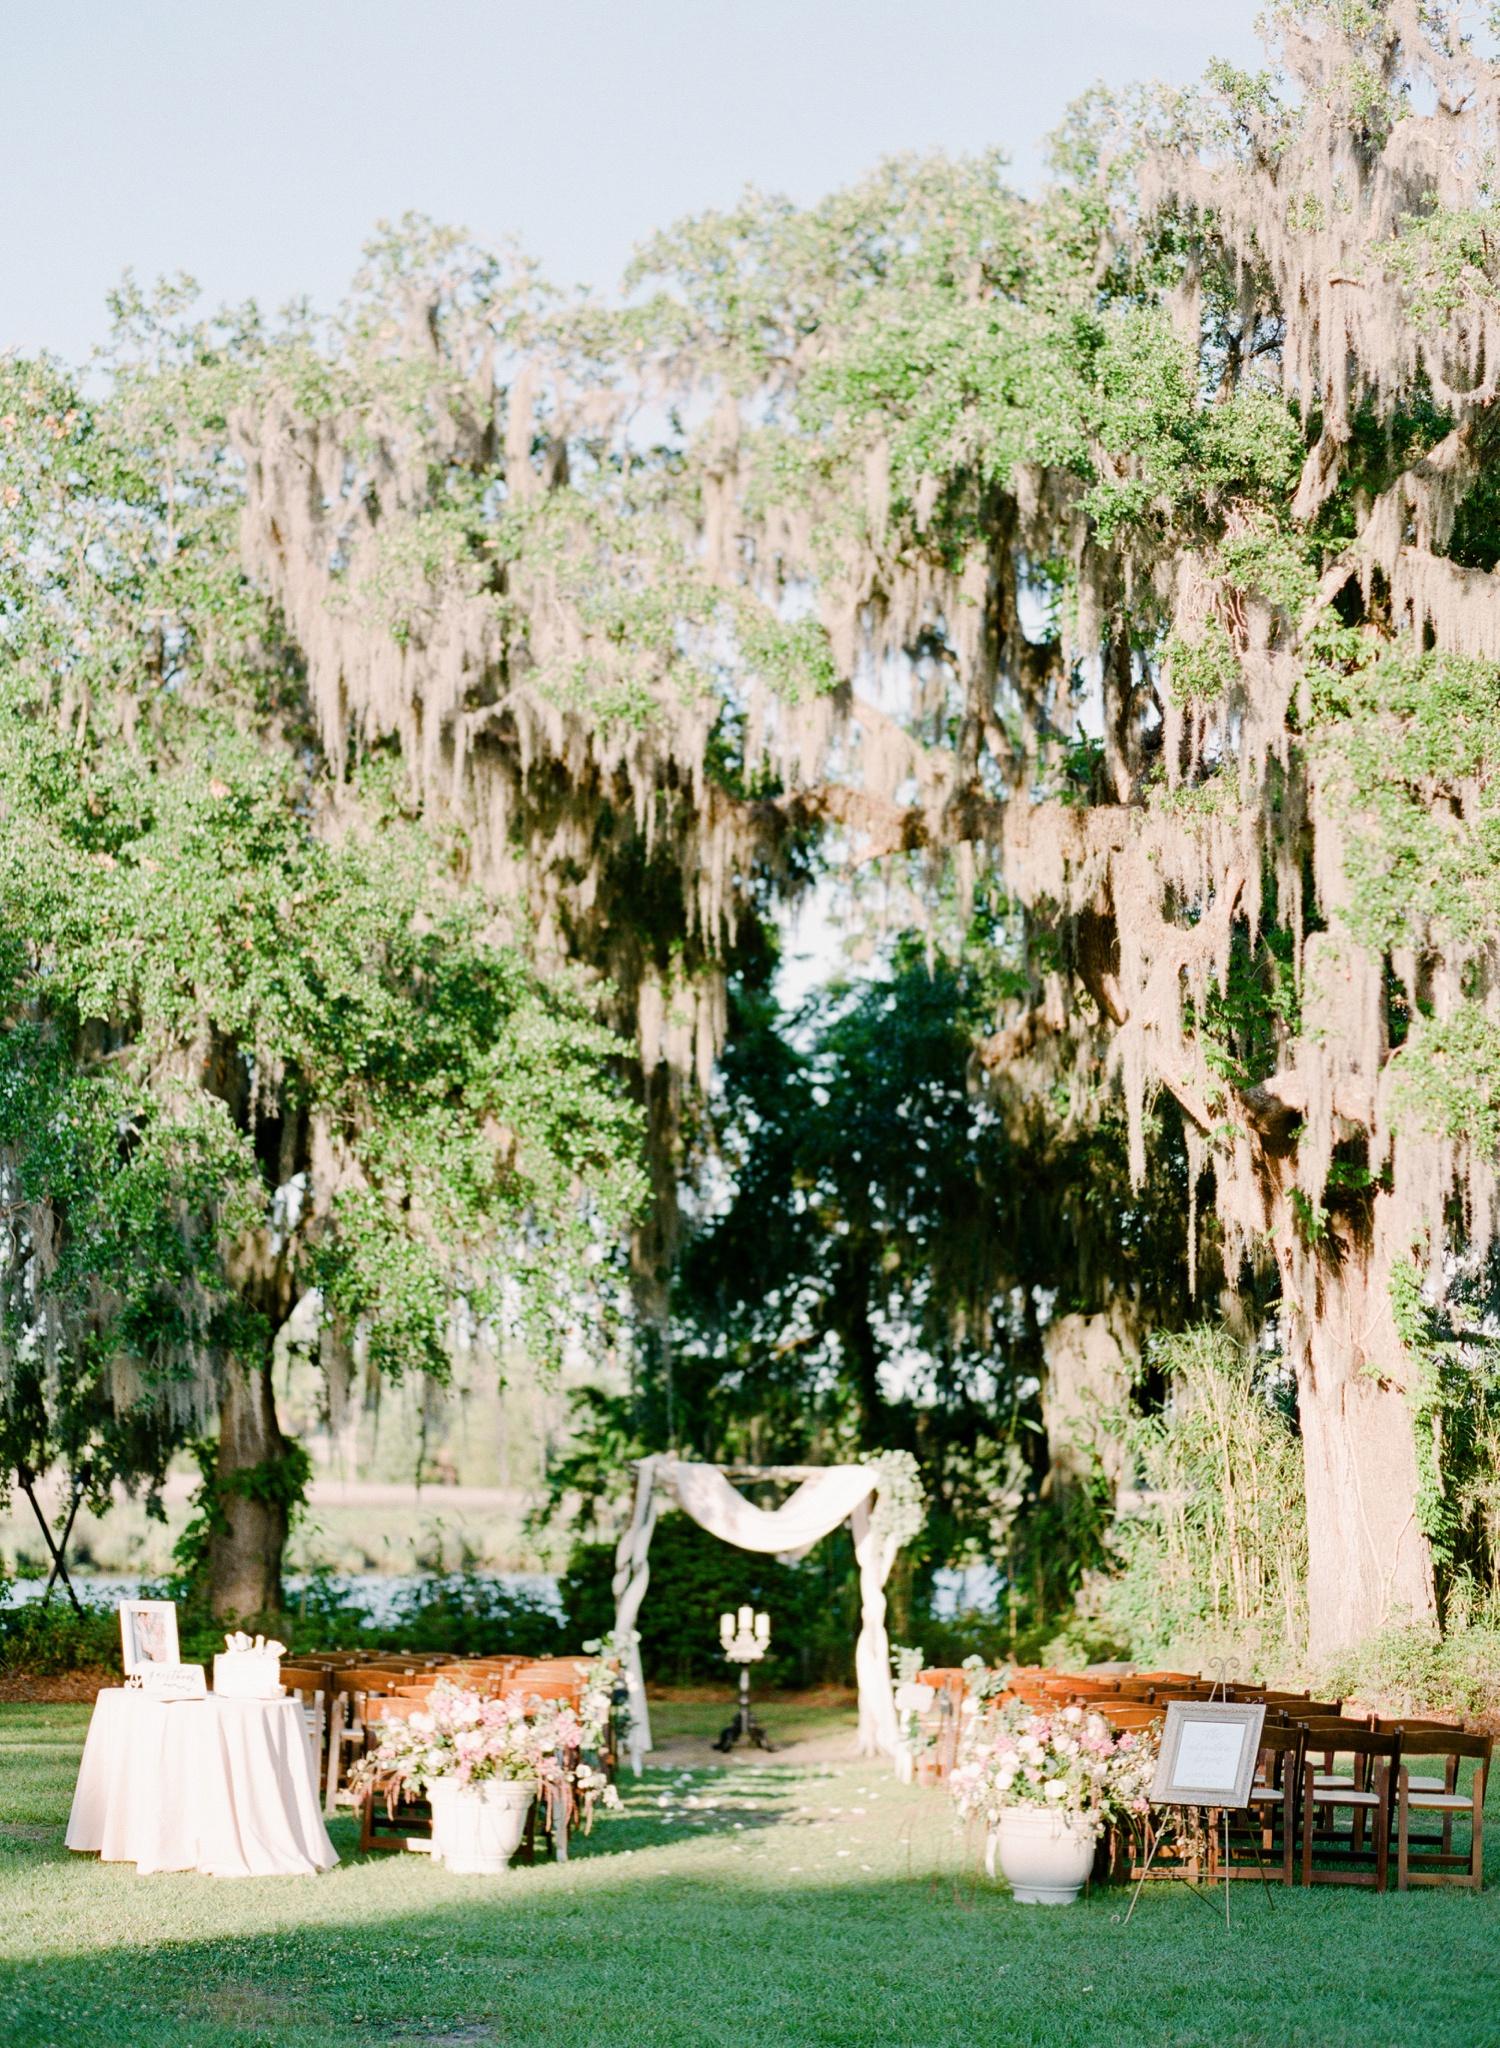 Magnolia-Garden-Southern-Weddings-Magazine_0027.jpg